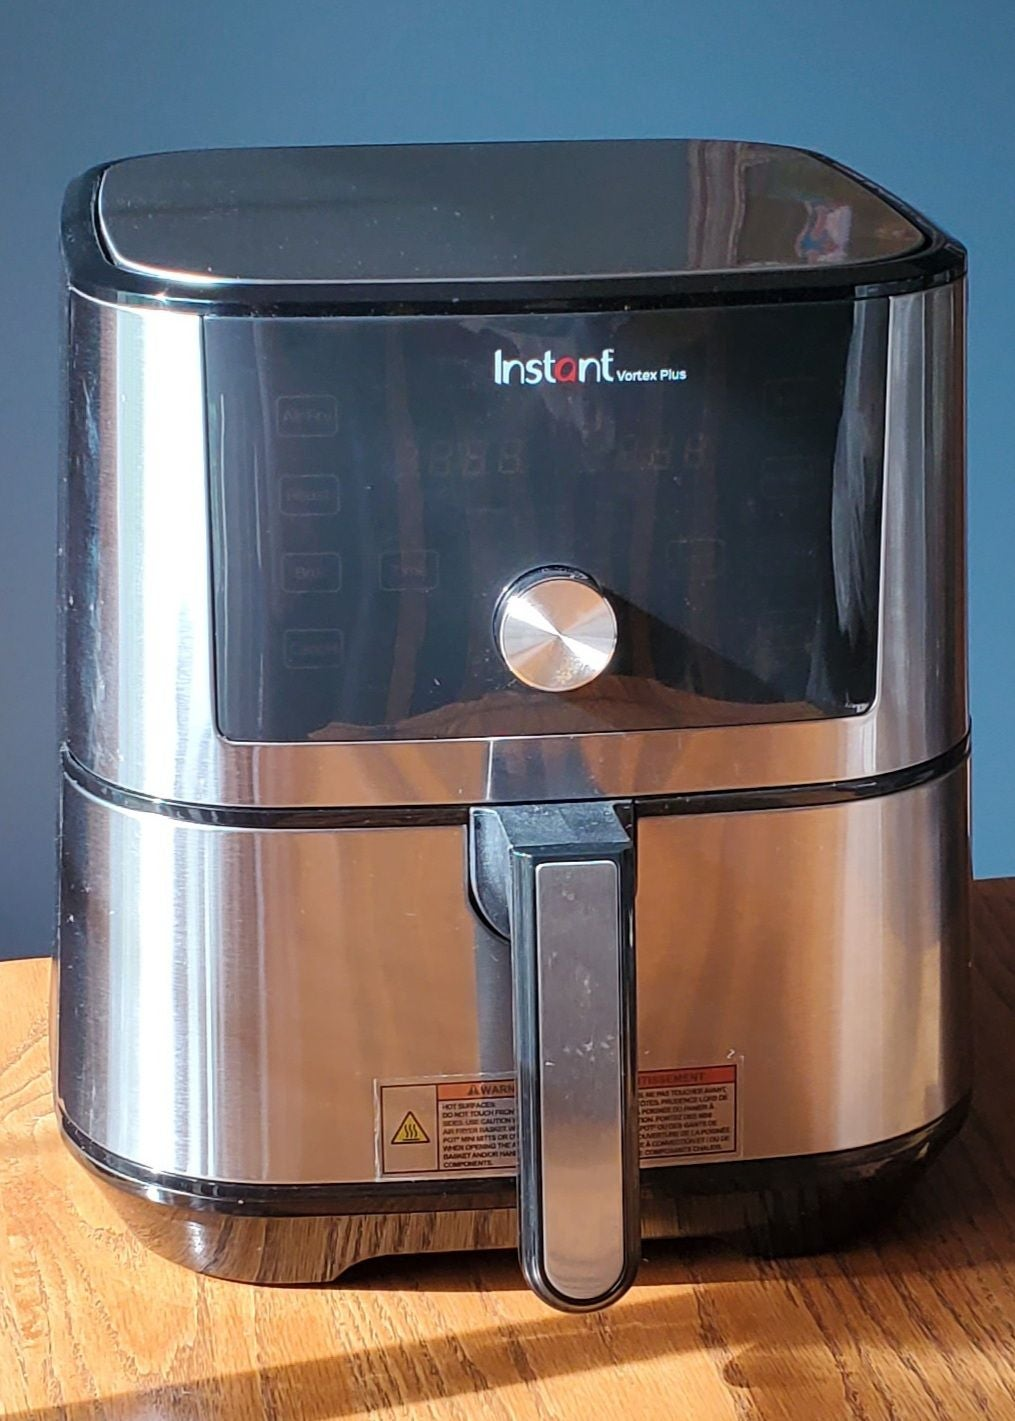 Instant Pot 6 quart air fryer 6-in-1